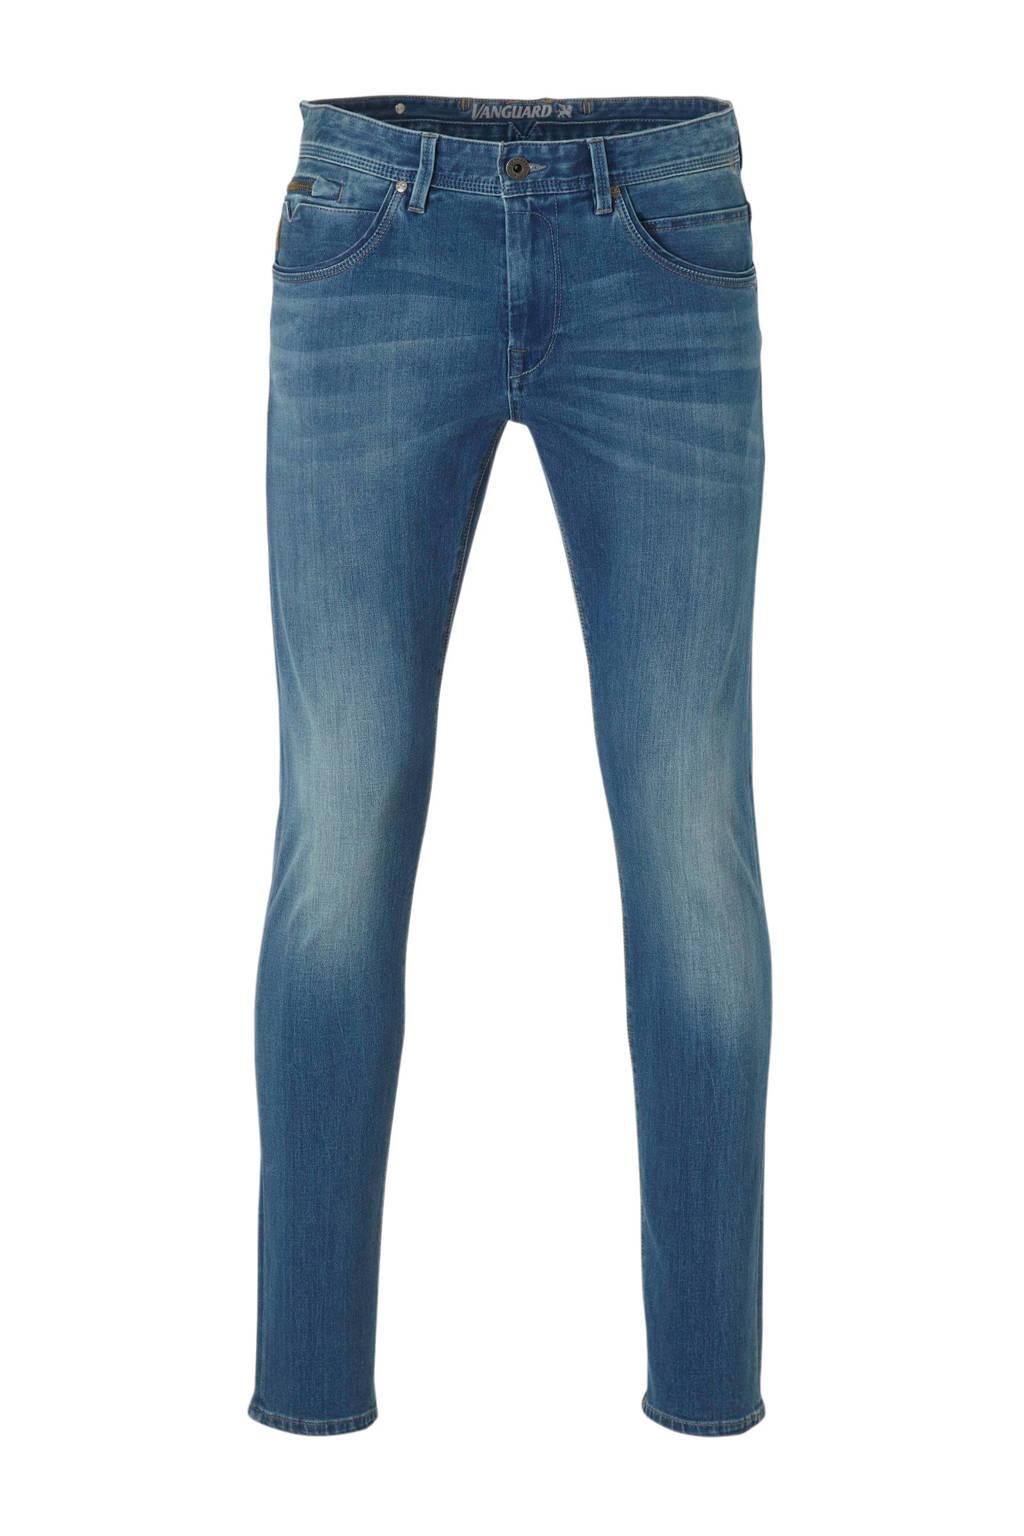 Vanguard slim fit jeans blauw, Dark Four Way